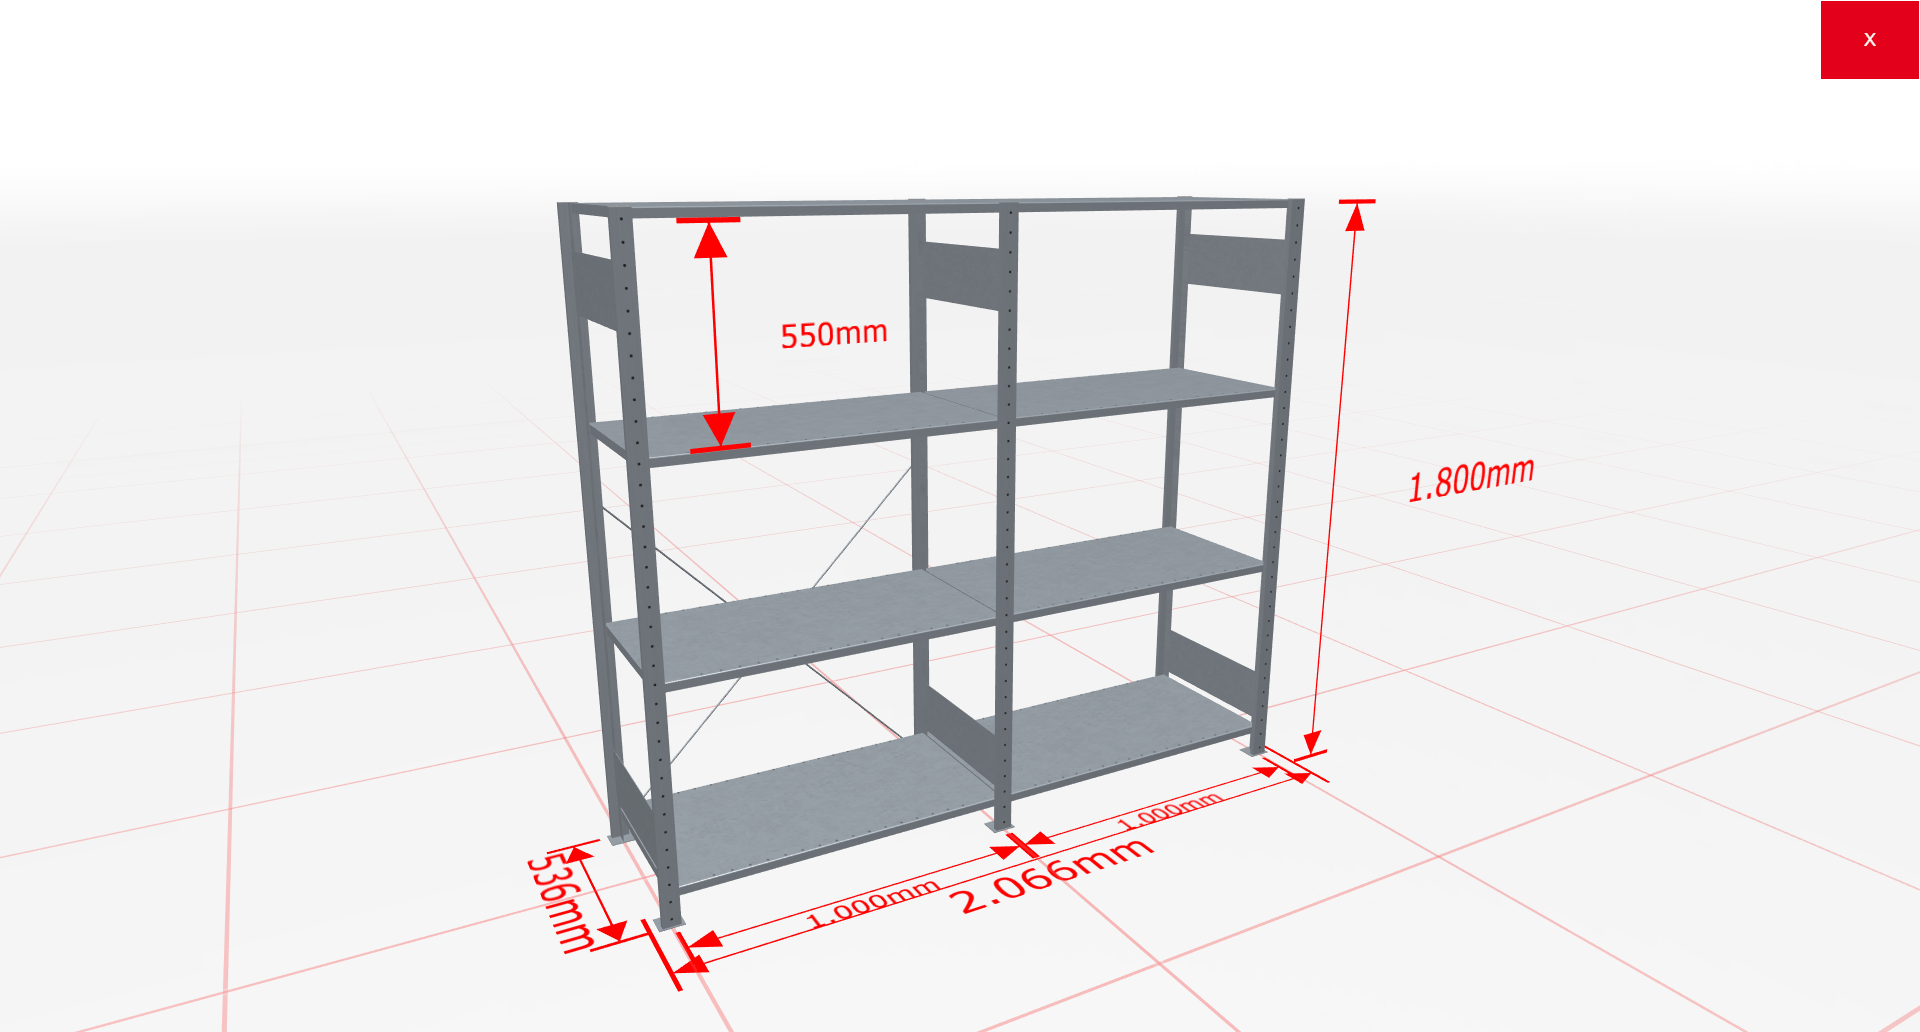 Fachbodenregal Komplettregal 1800x2066x500 mm (HxBxT) SCHULTE Lagertechnik verzinkt 4 Ebenen  150 kg je Boden